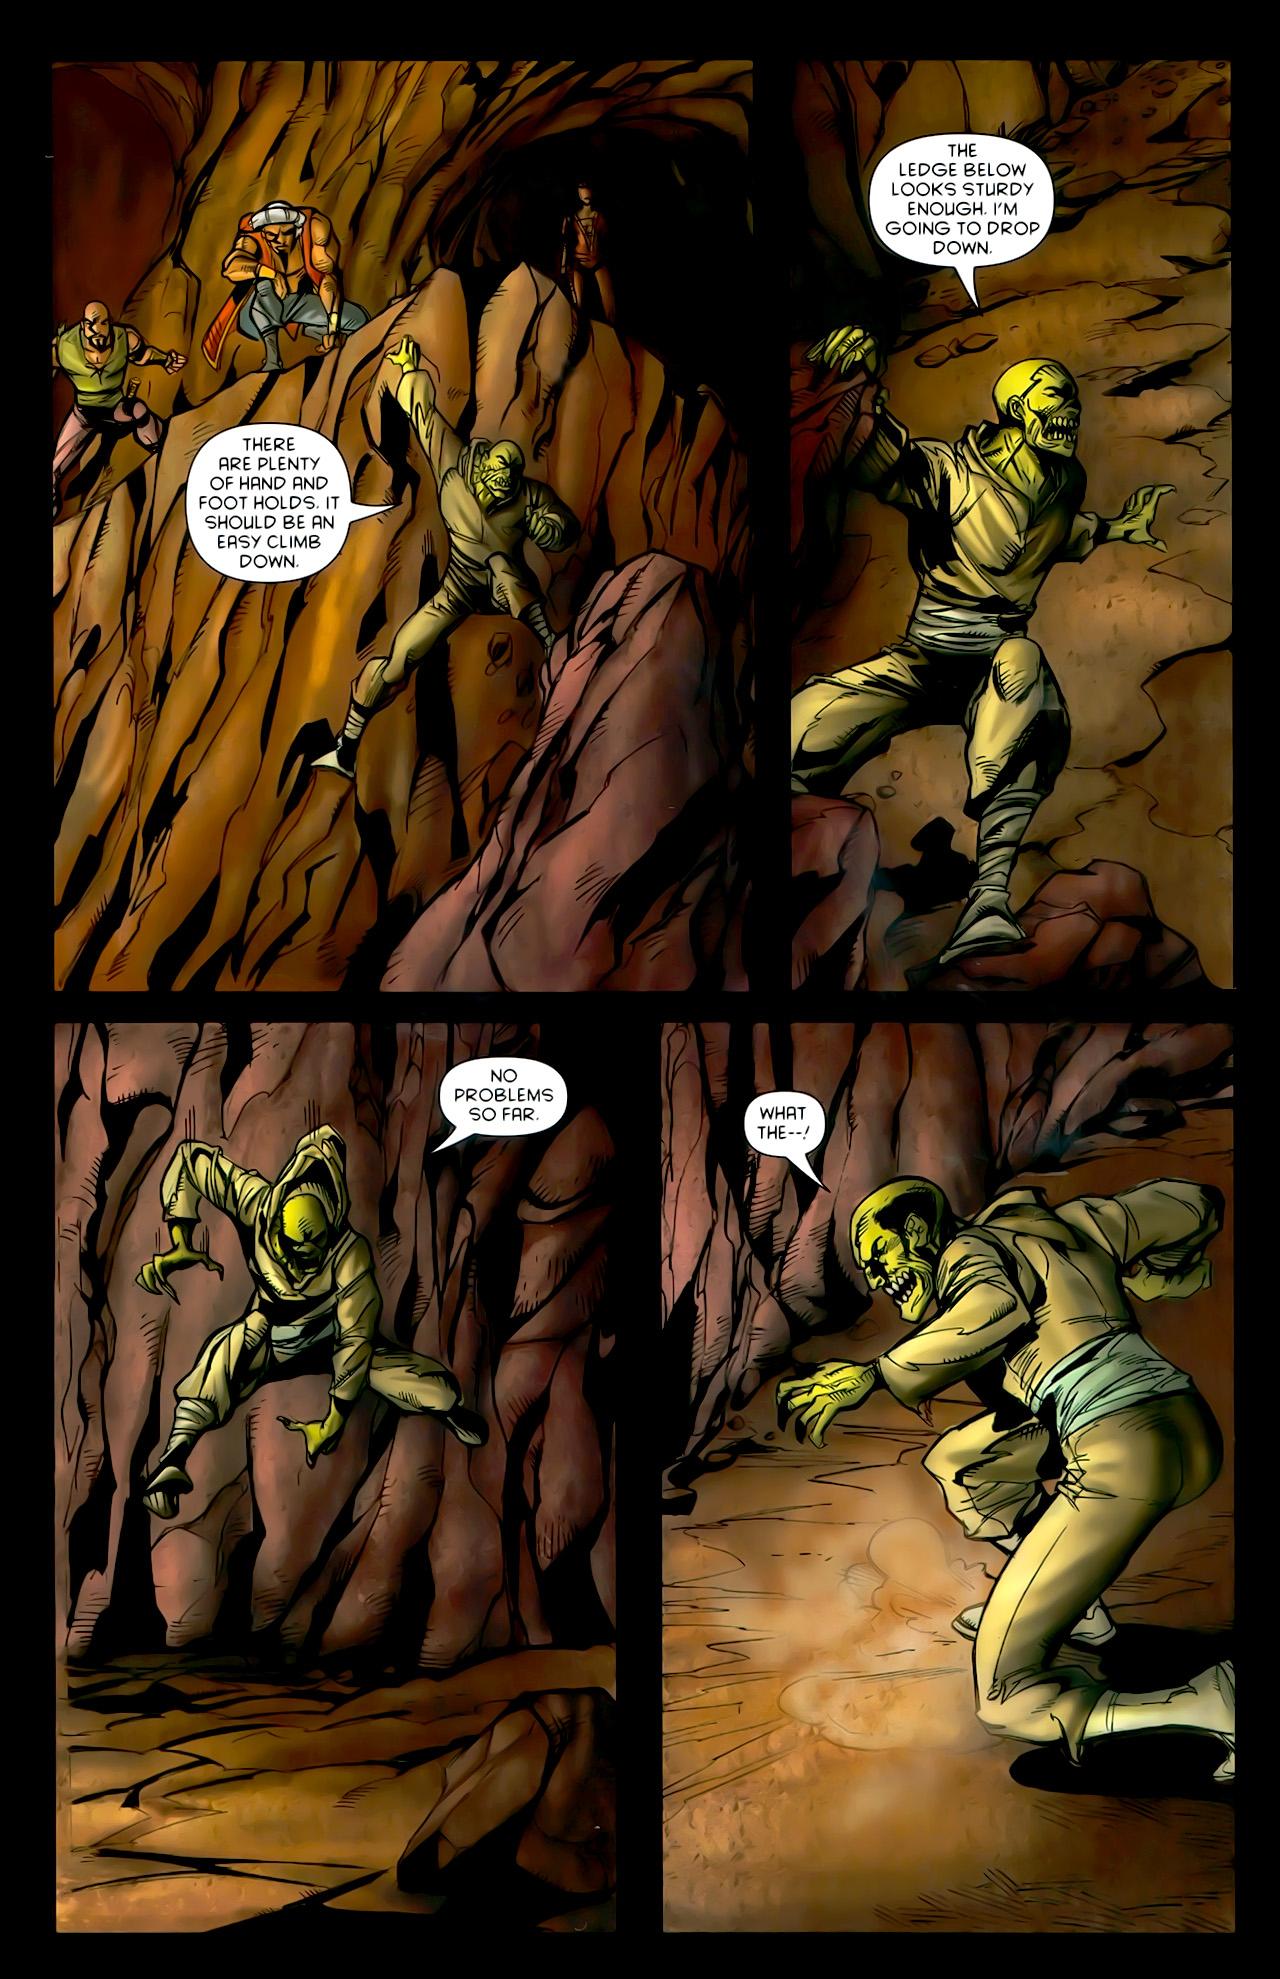 Read online 1001 Arabian Nights: The Adventures of Sinbad comic -  Issue #10 - 15